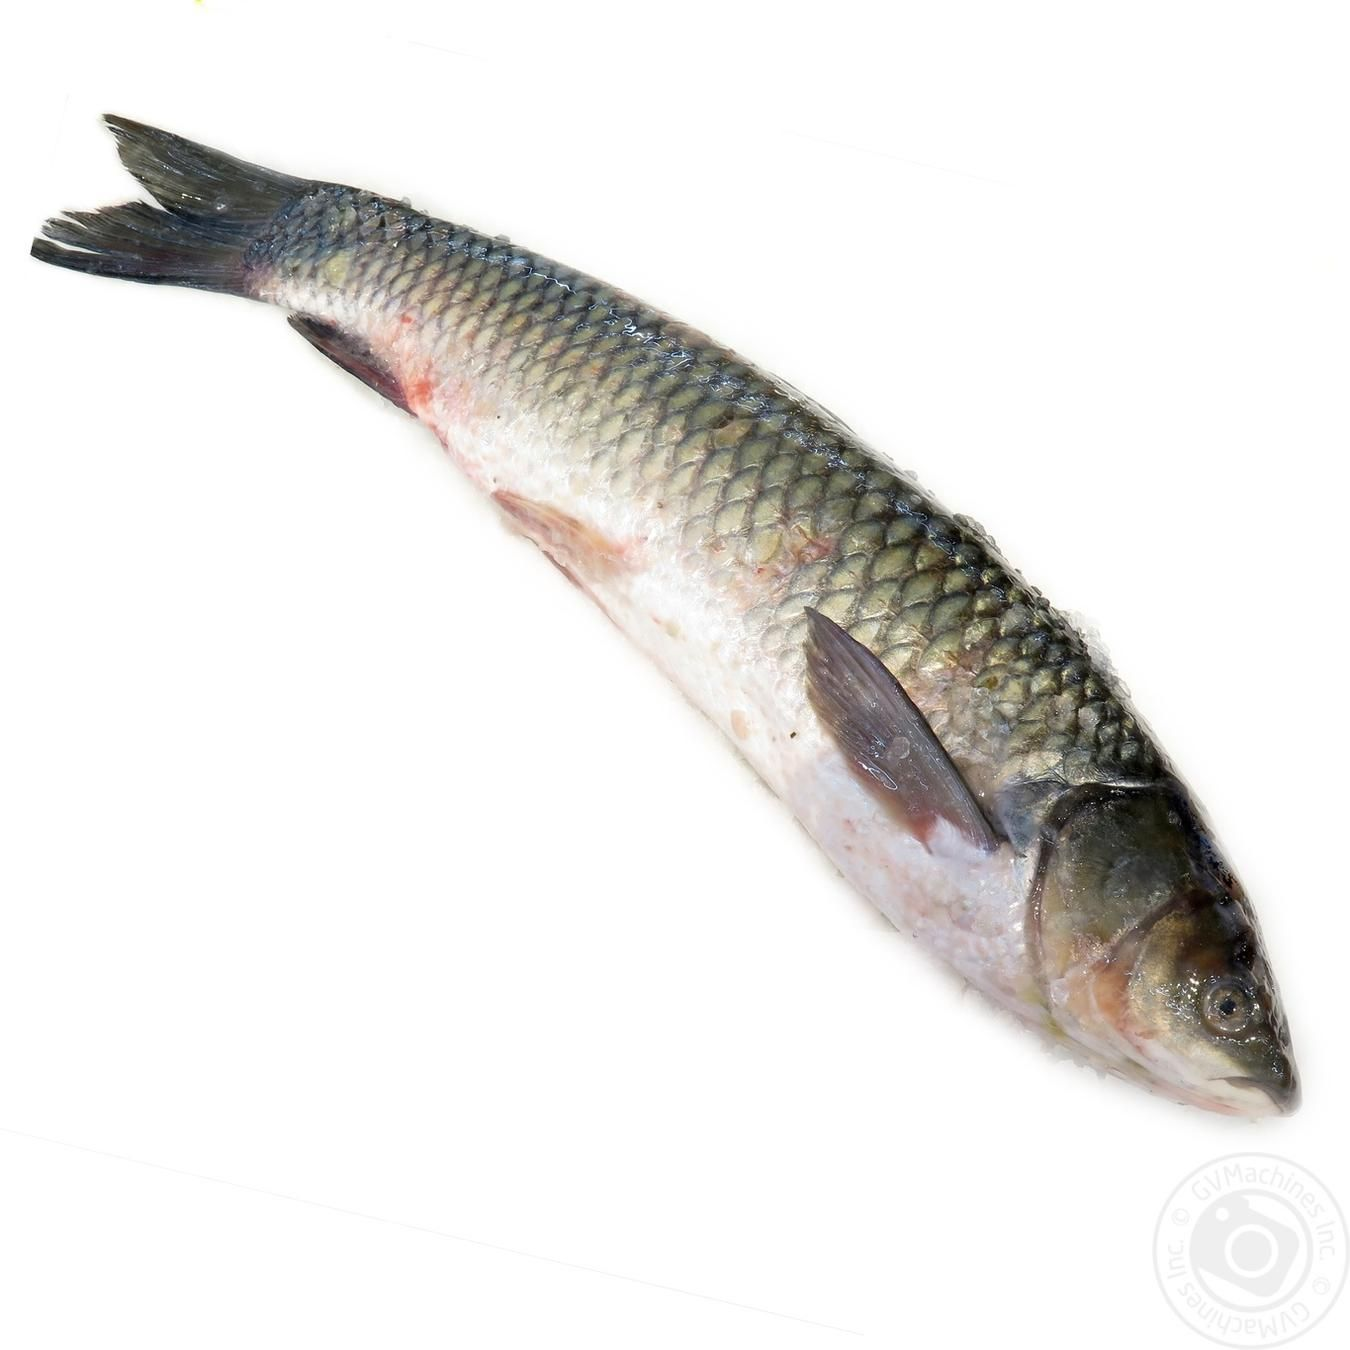 Fish grass carp fresh meat fish poultry fresh fish for White amur fish